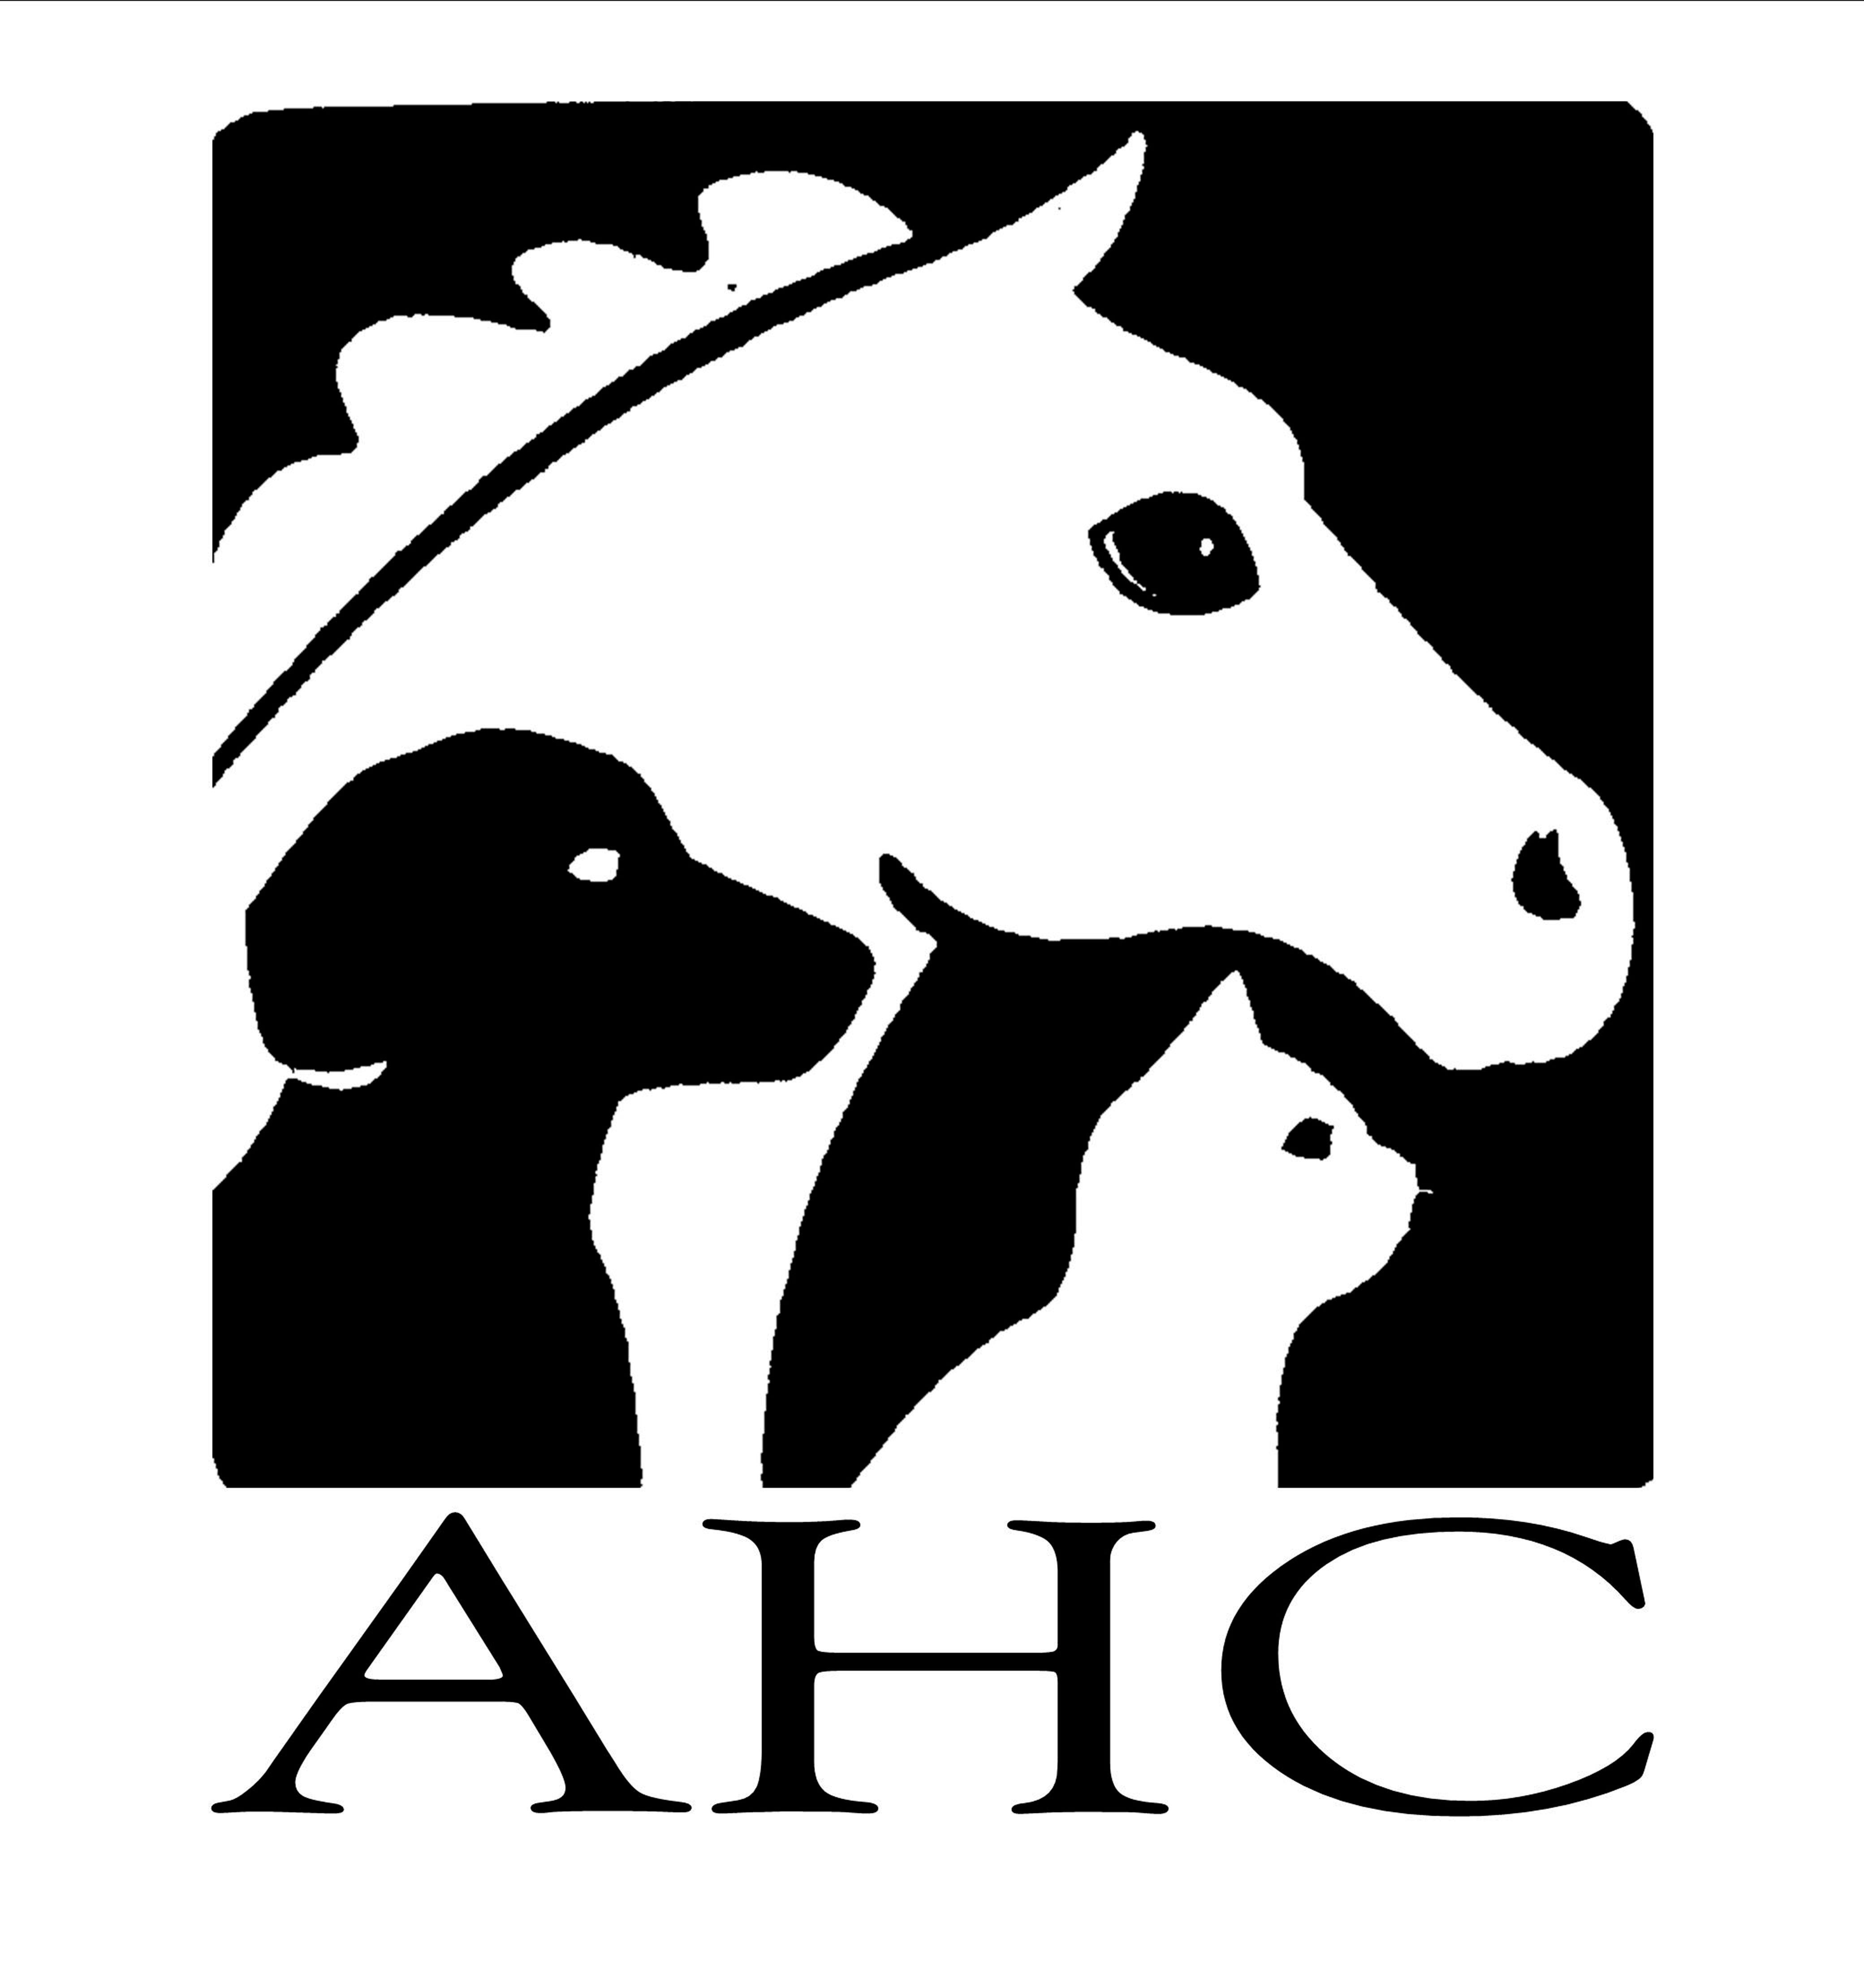 AHC_LOGO_2008.18120142.jpg